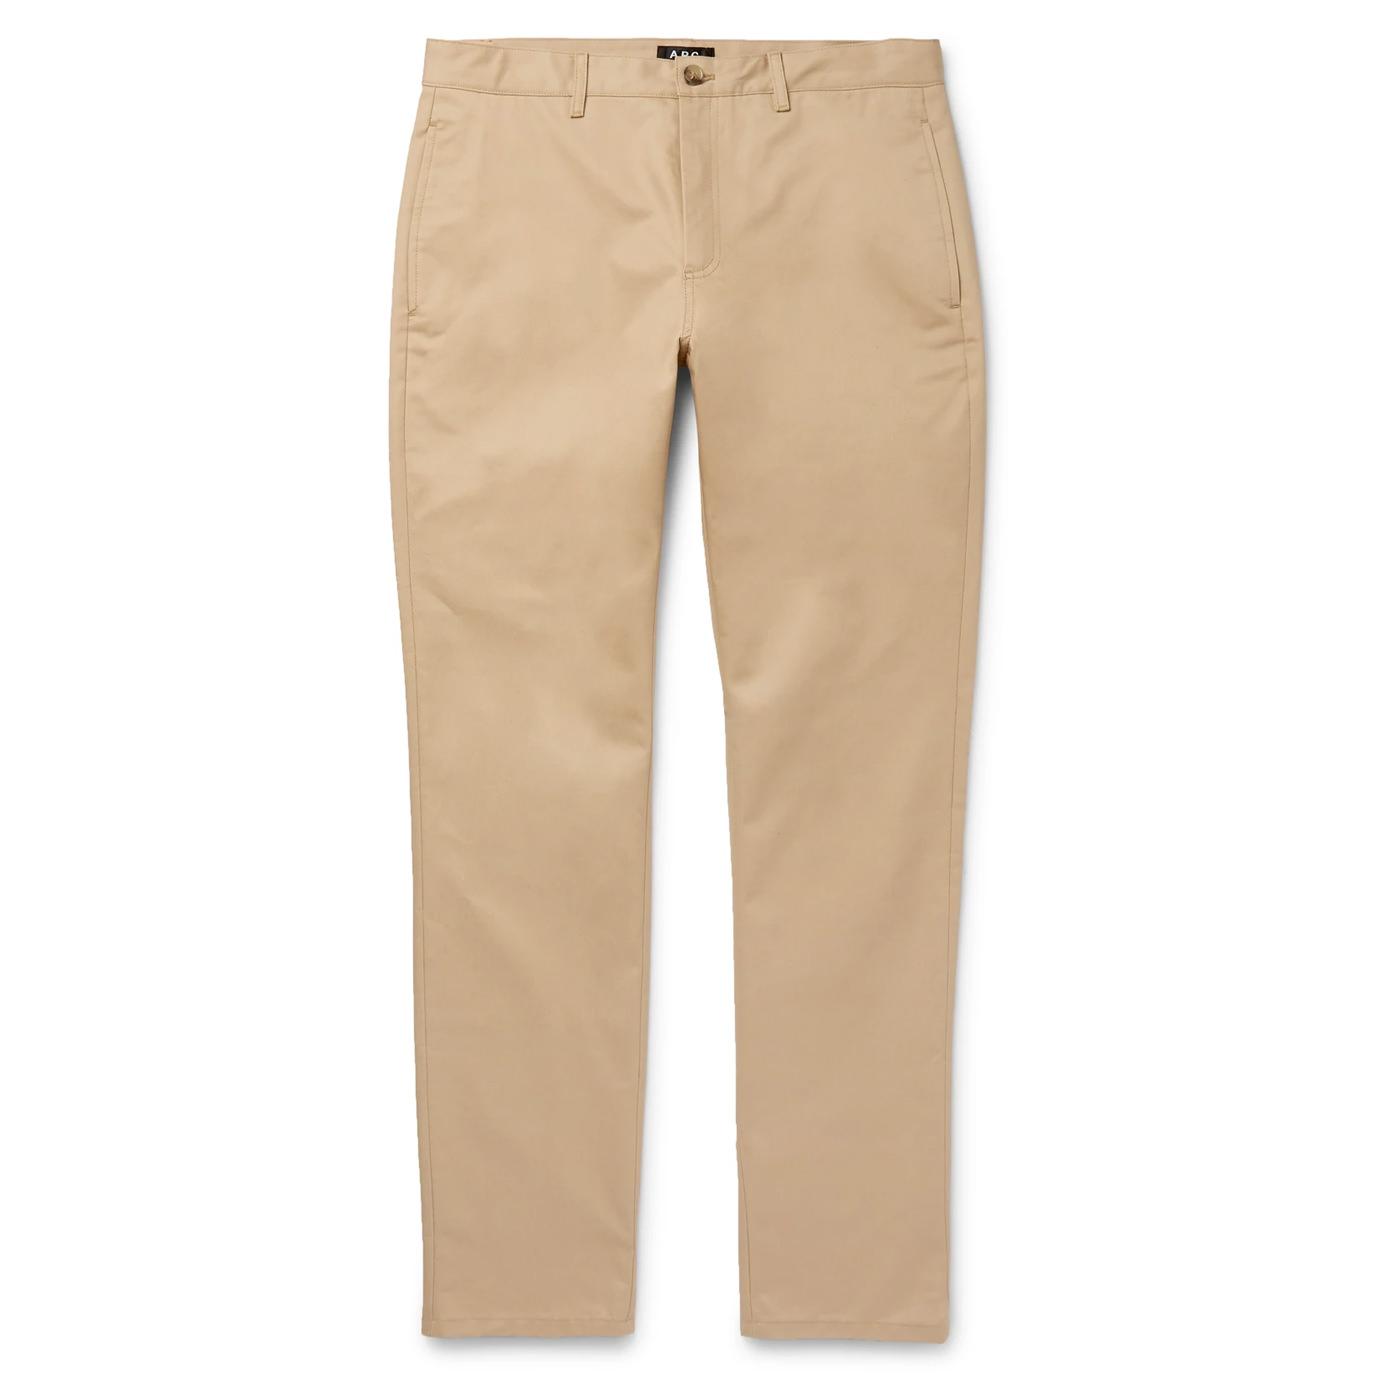 Style Mr Porter Pantalon Chinos APC Navy Classic Beige